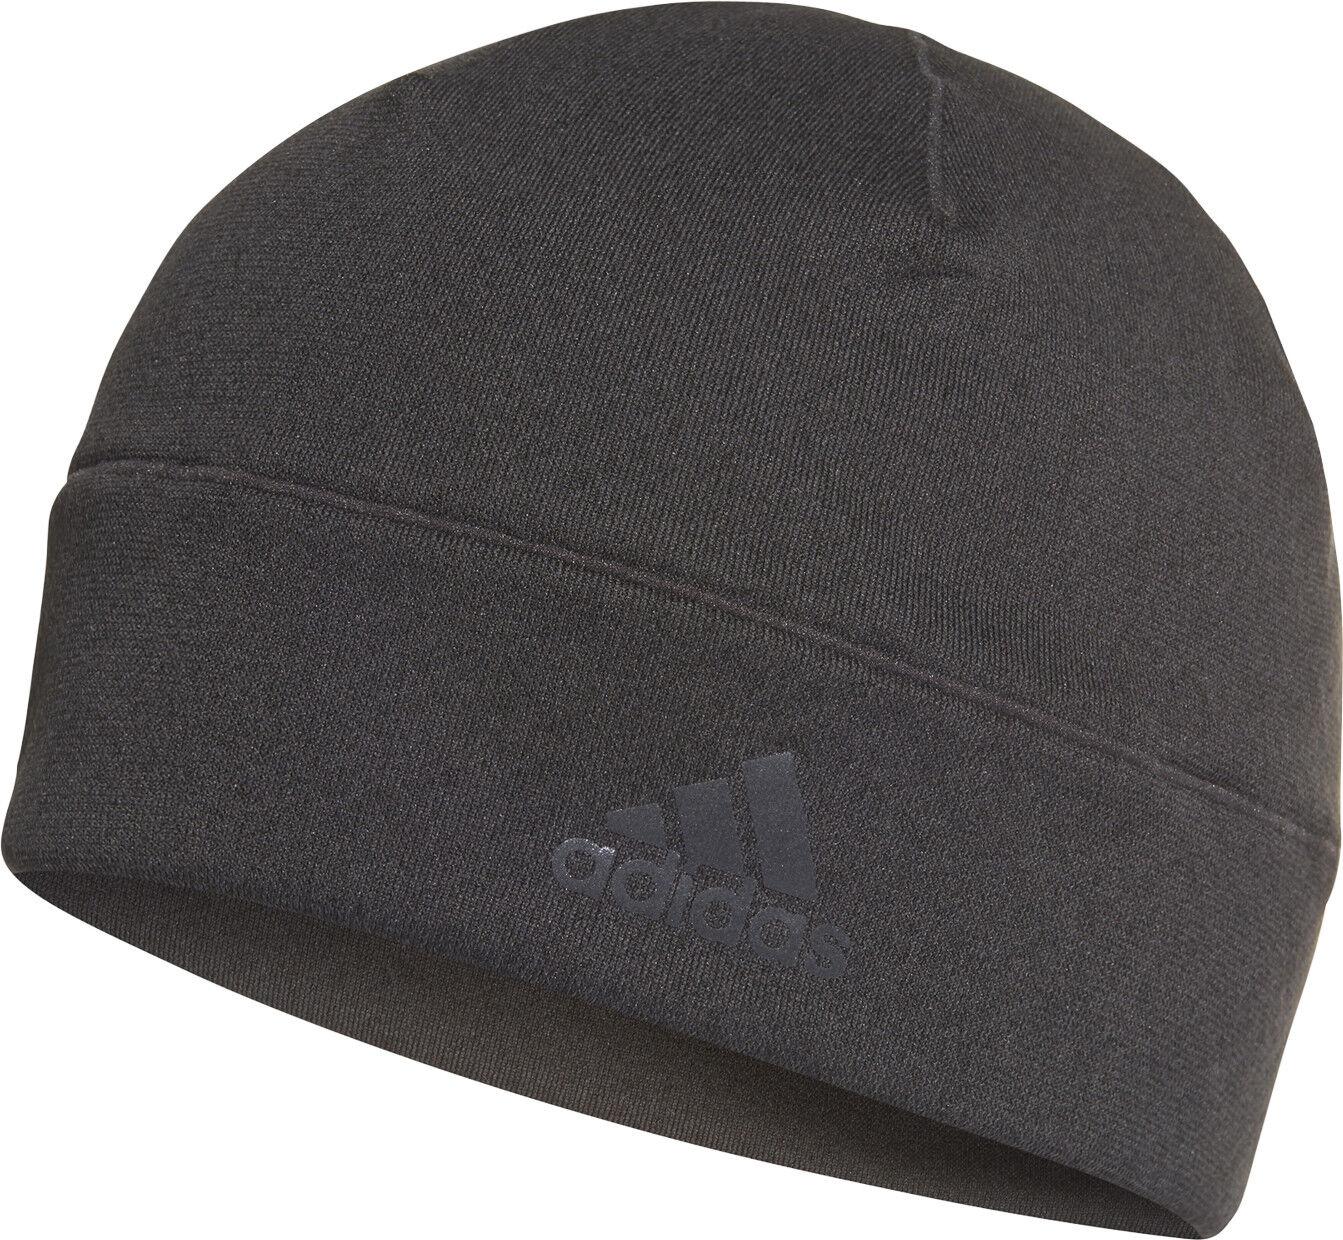 adidas Climaheat Running Beanie Mens Womens Insulated Winter Hat ... eabd09a91a